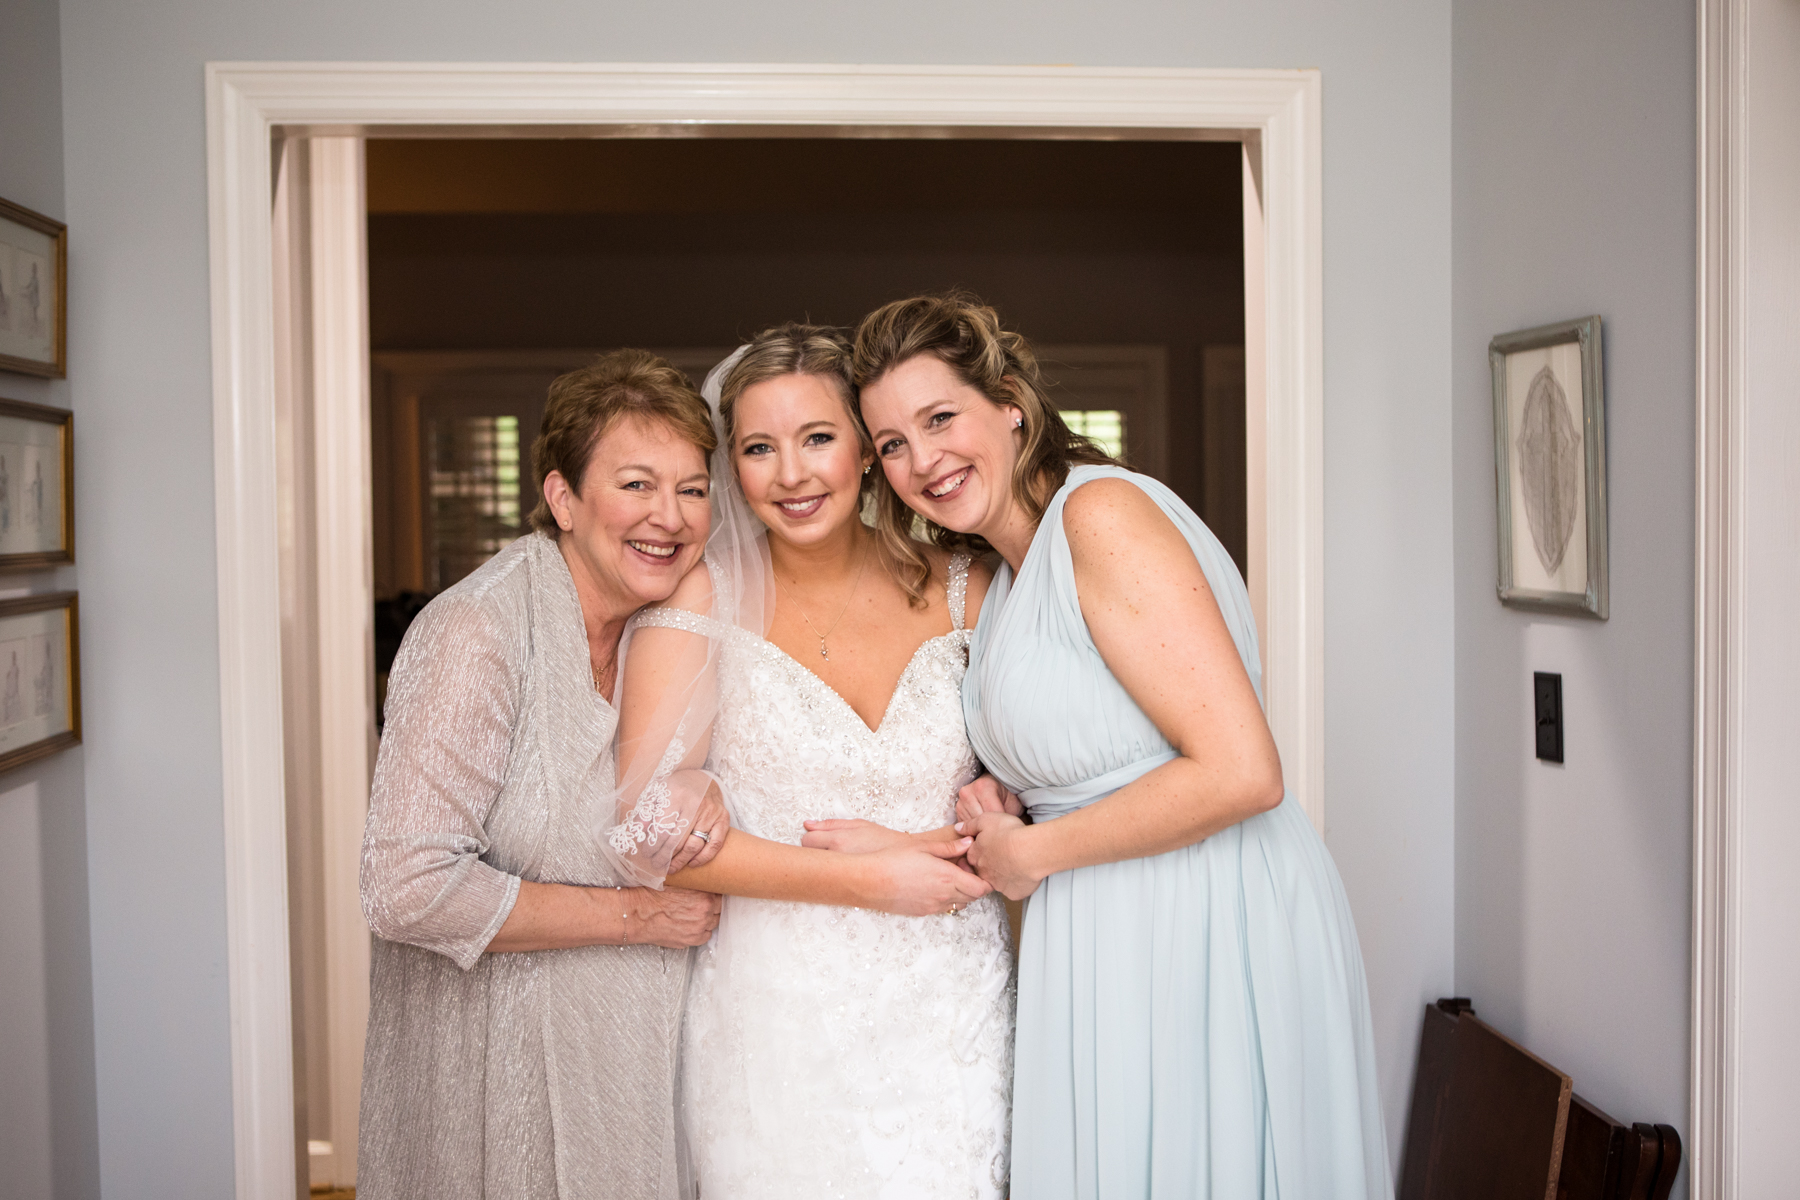 Kelli-and-Matt-Nashville-Wedding-Sneak-Peak-0072.jpg